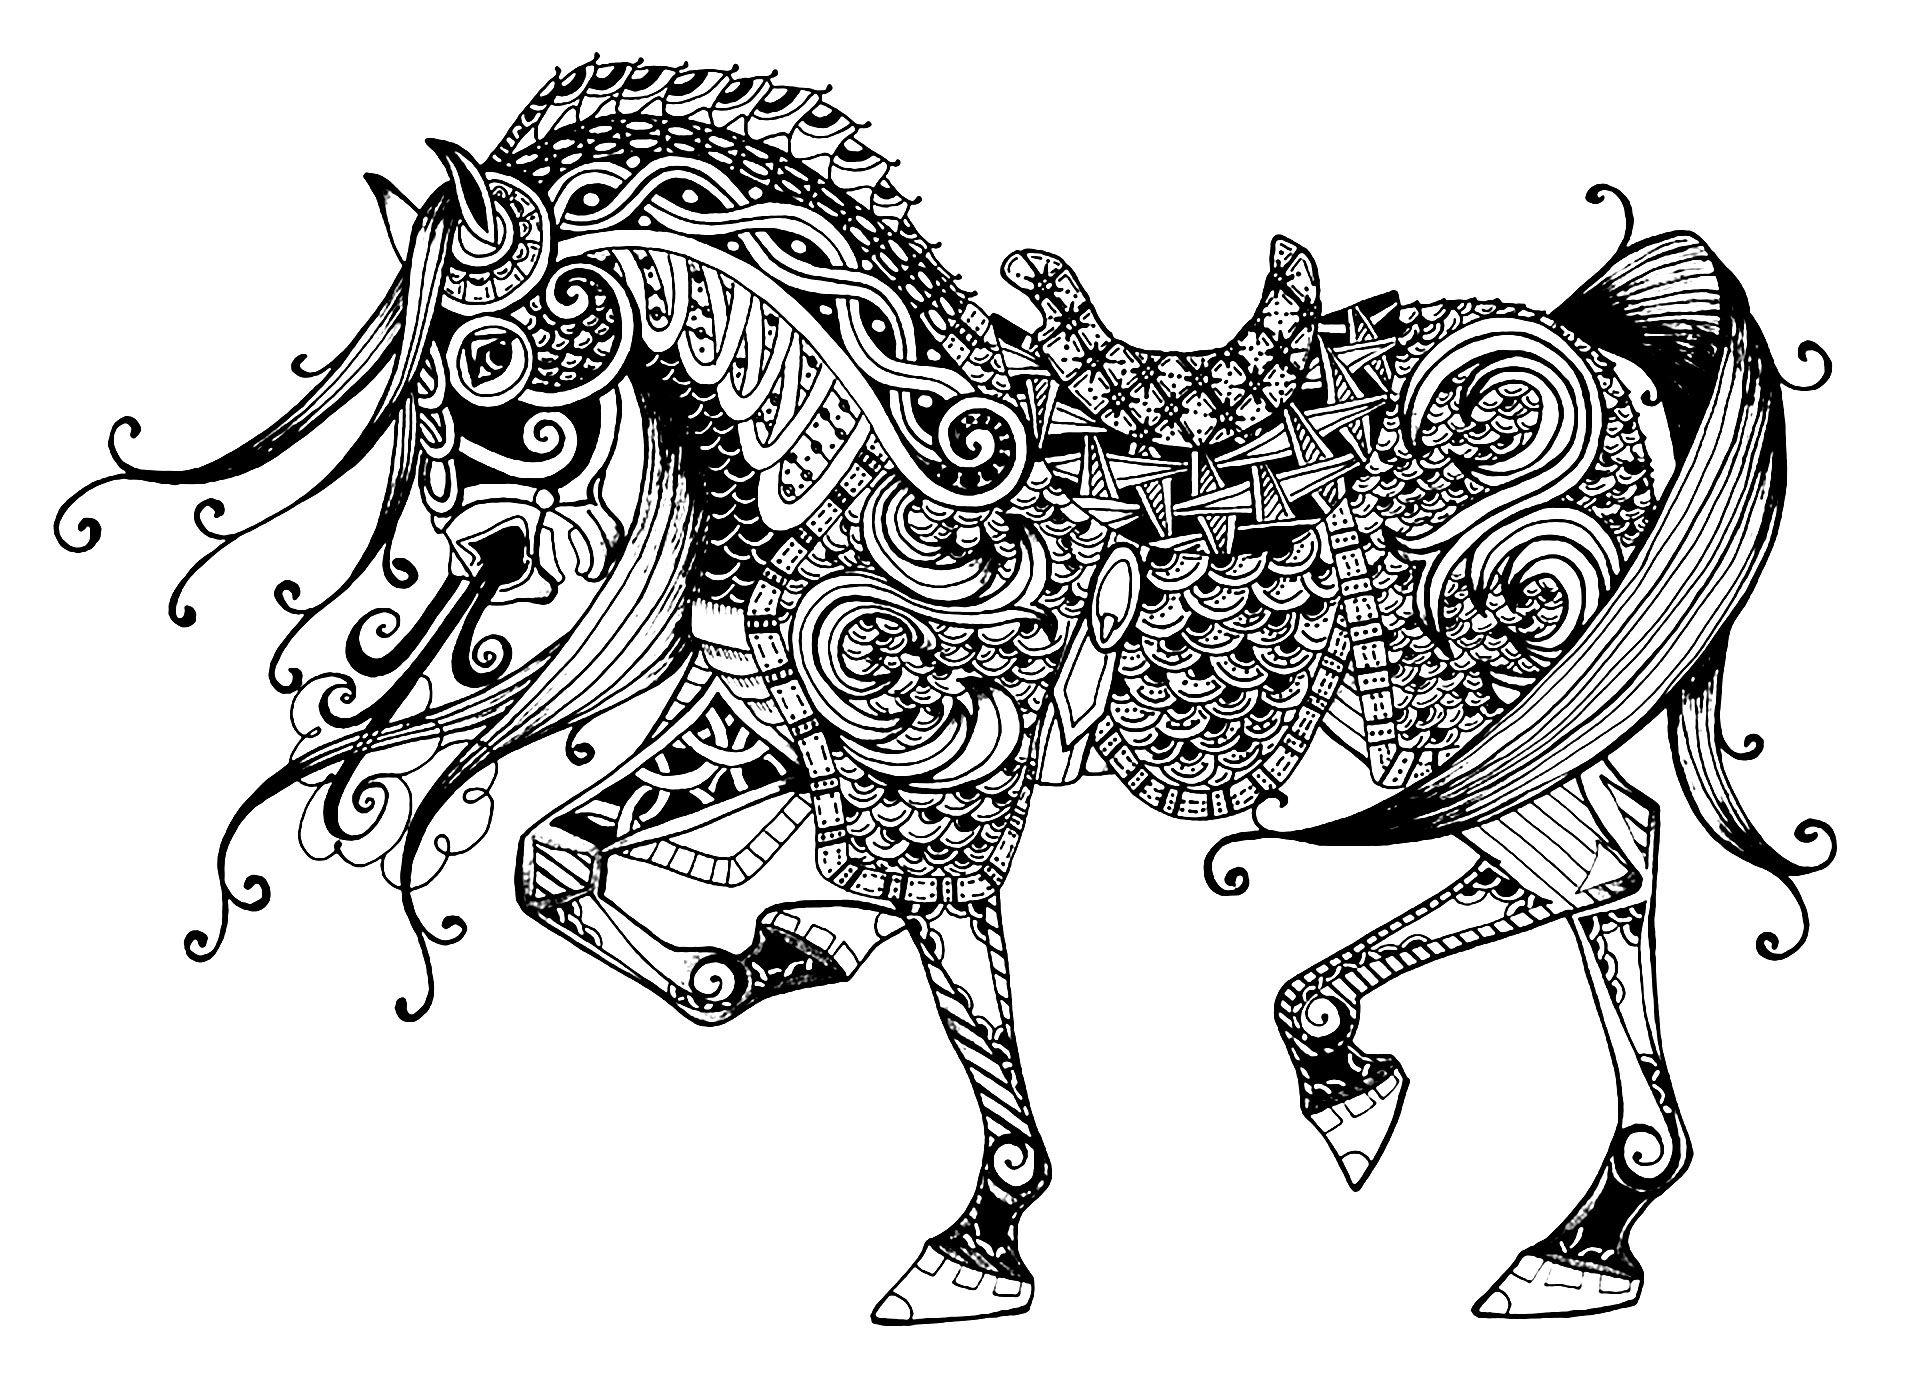 Graffiti Animal Print Out Colouring Sheets Animals Coloring